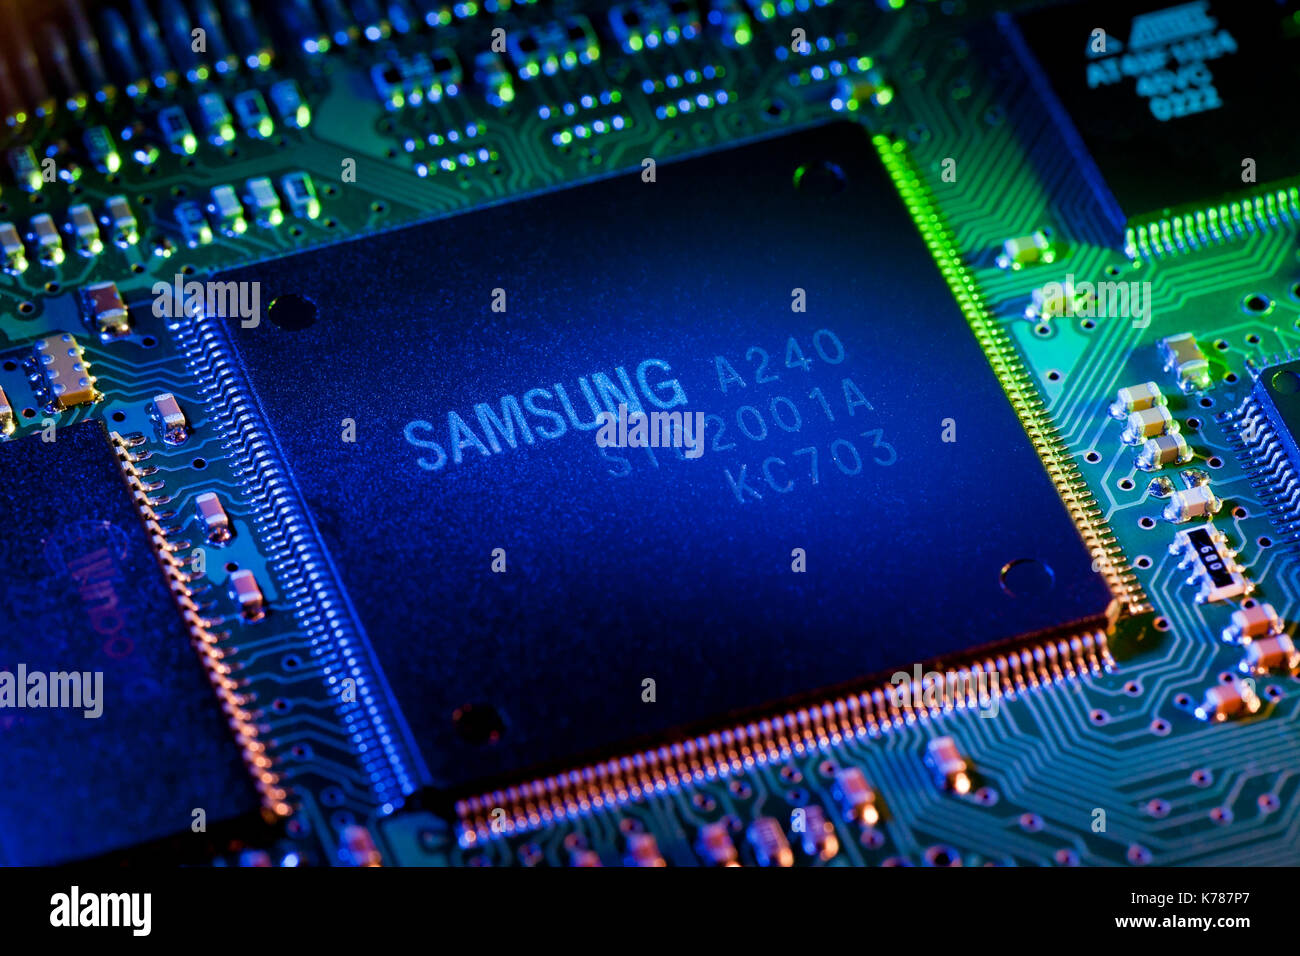 Samsung SID2001A CPU on hard disk drive control board - Stock Image